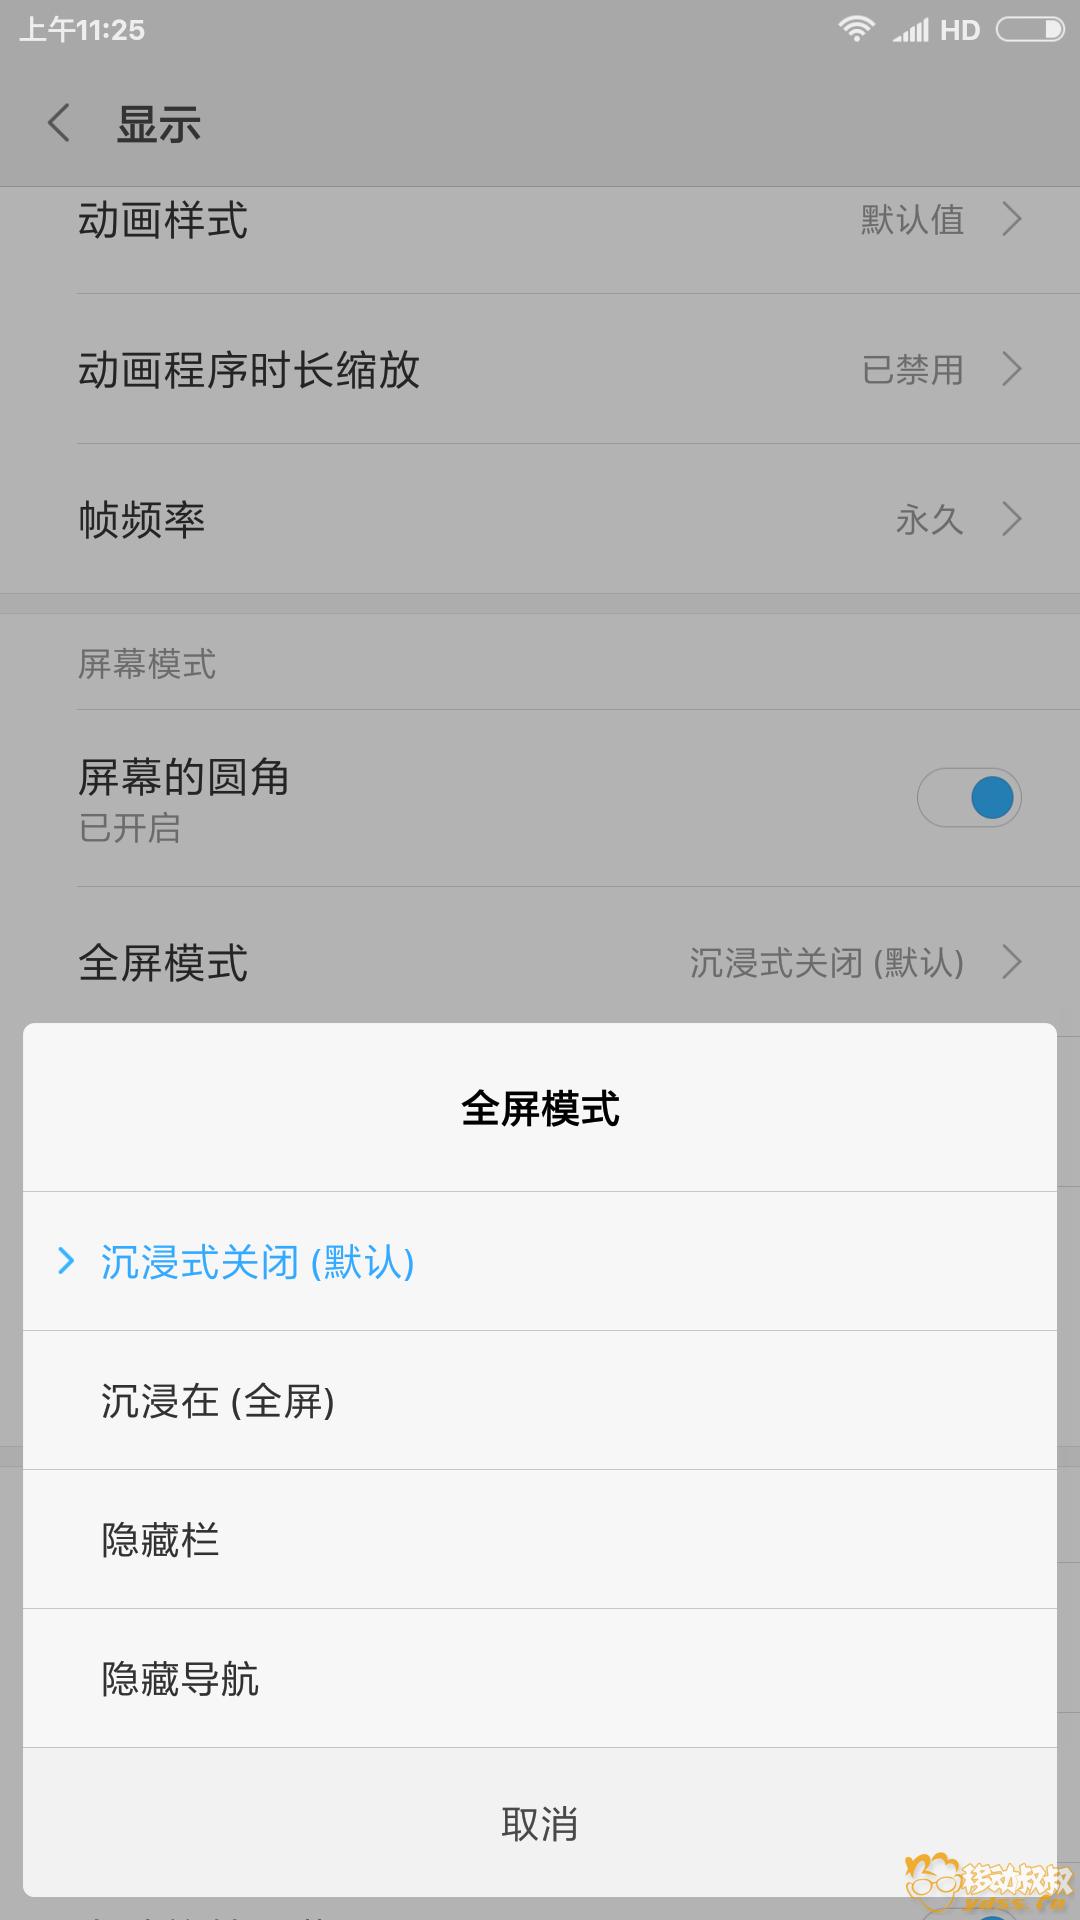 Screenshot_2018-05-04-11-25-23-117_com.android.settings.png